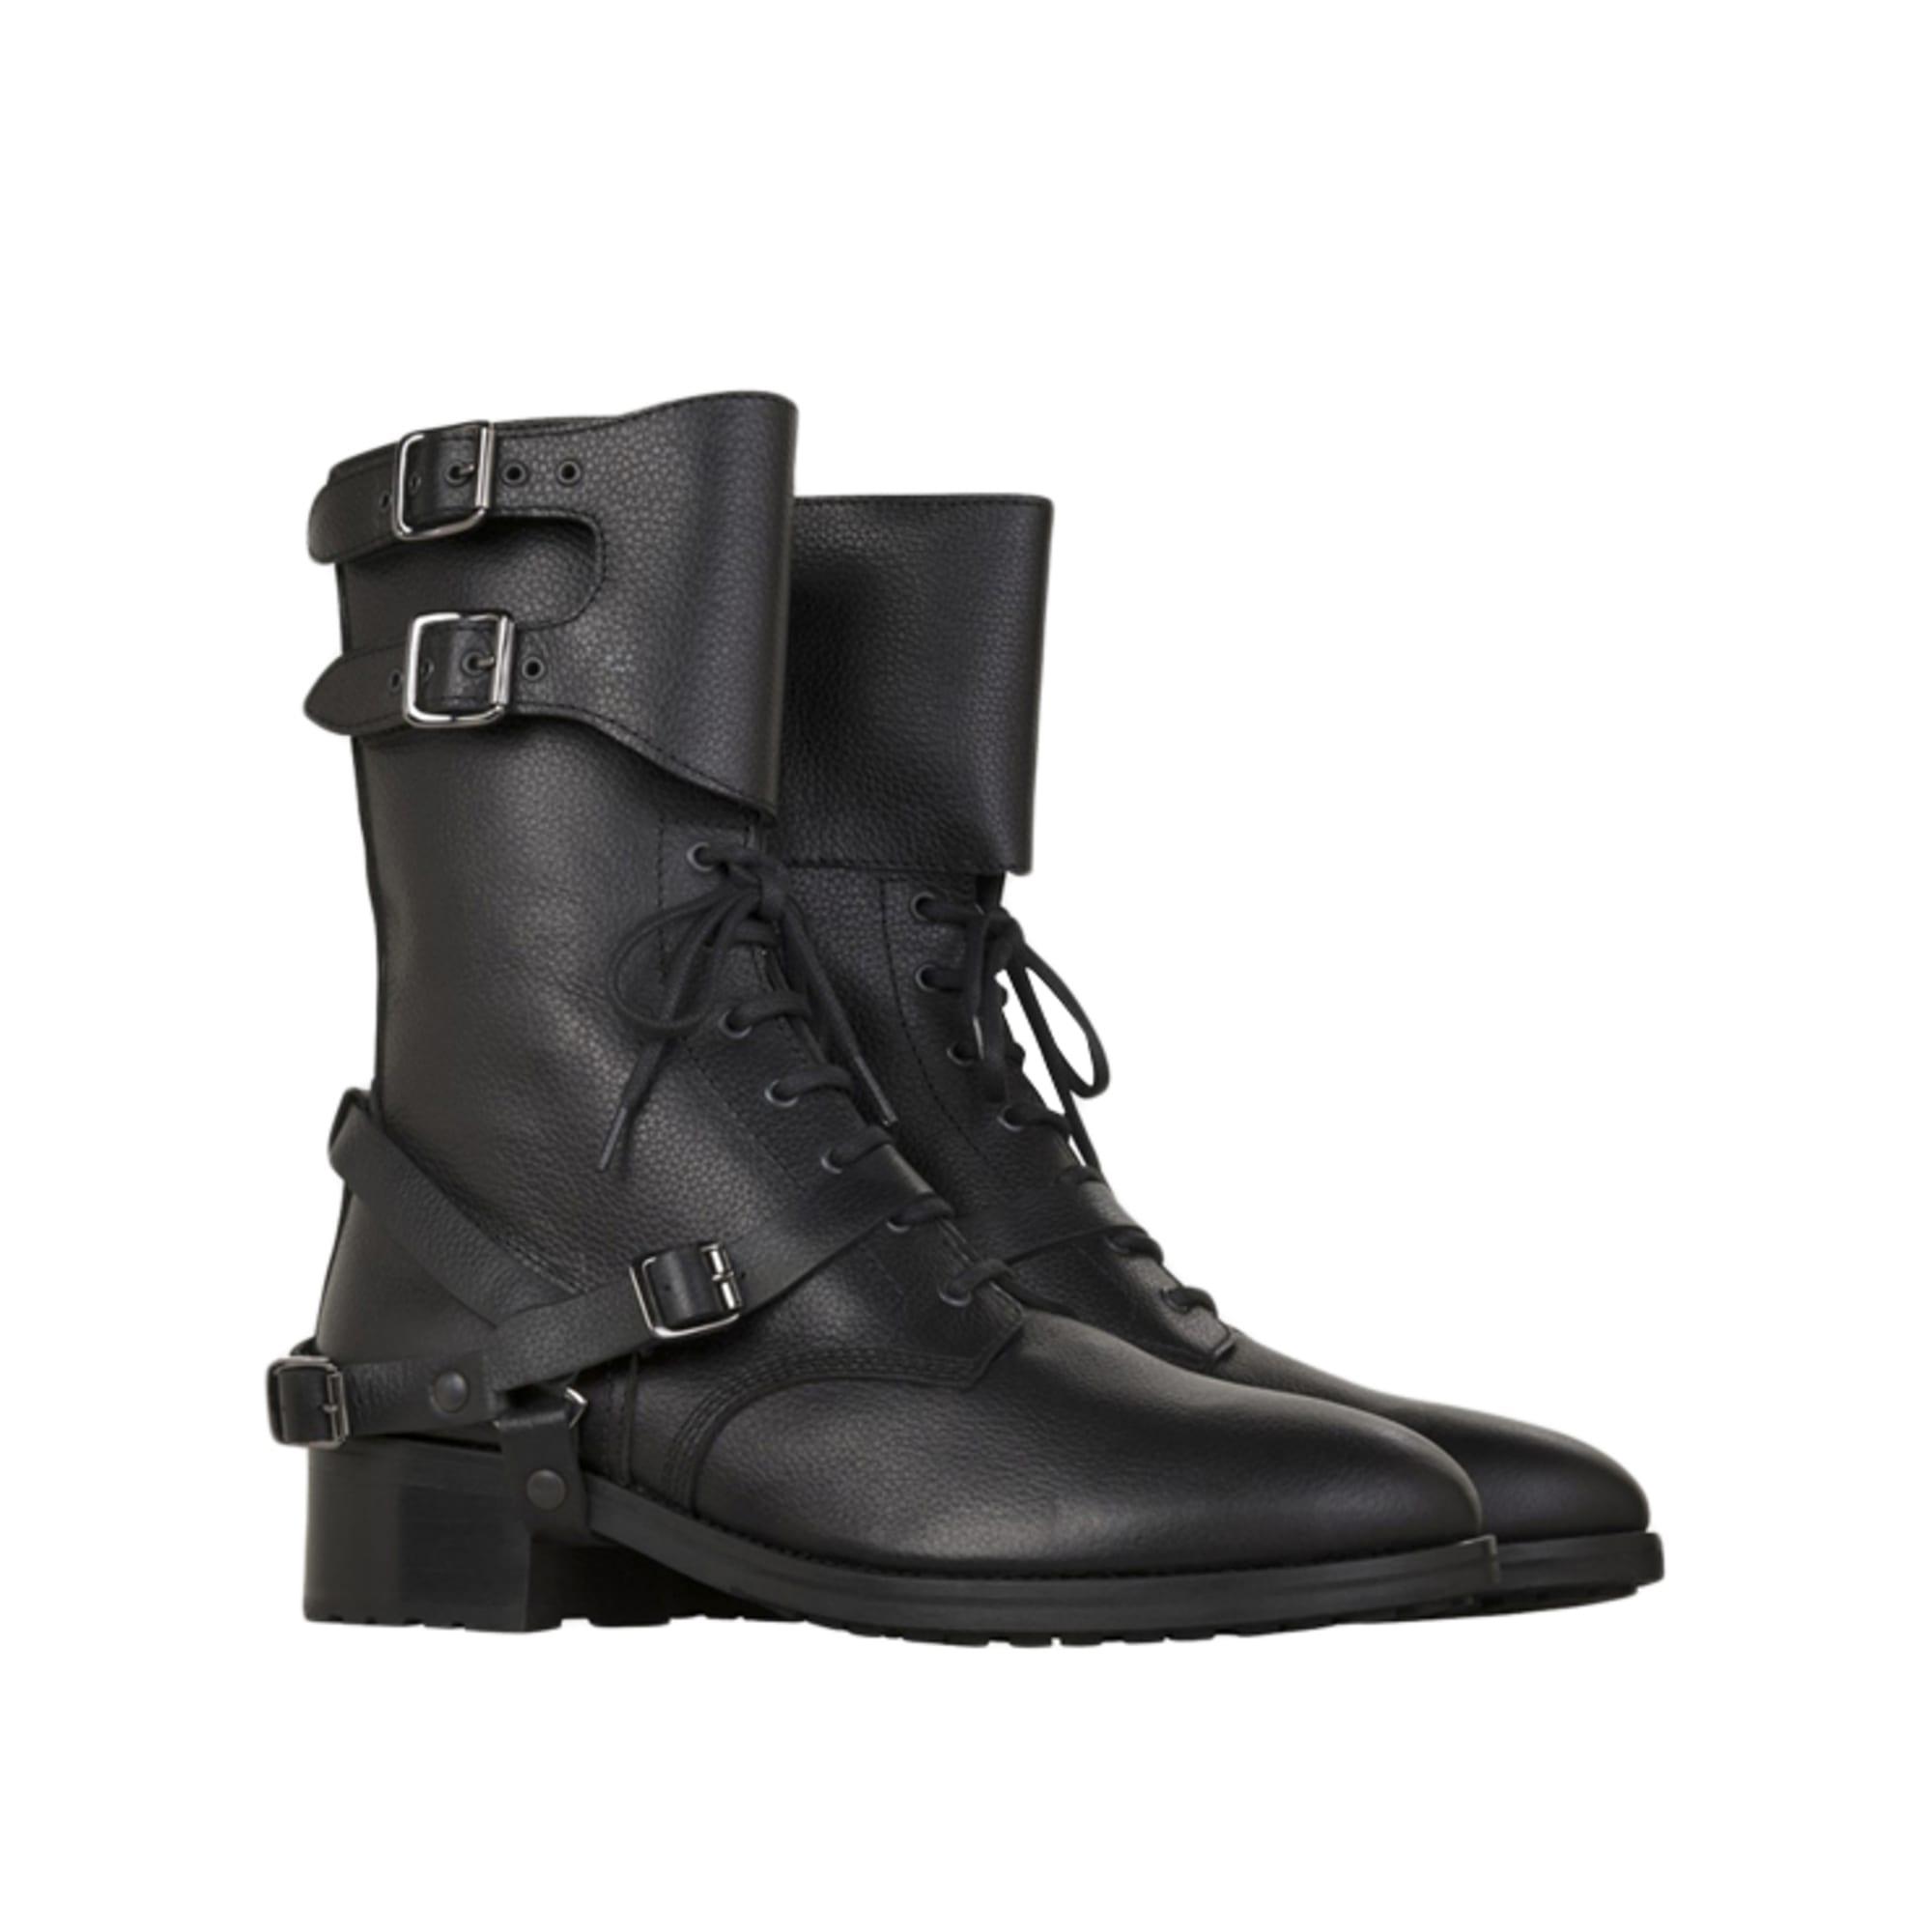 Bottines & low boots motards THE KOOPLES 37 noir 3281485